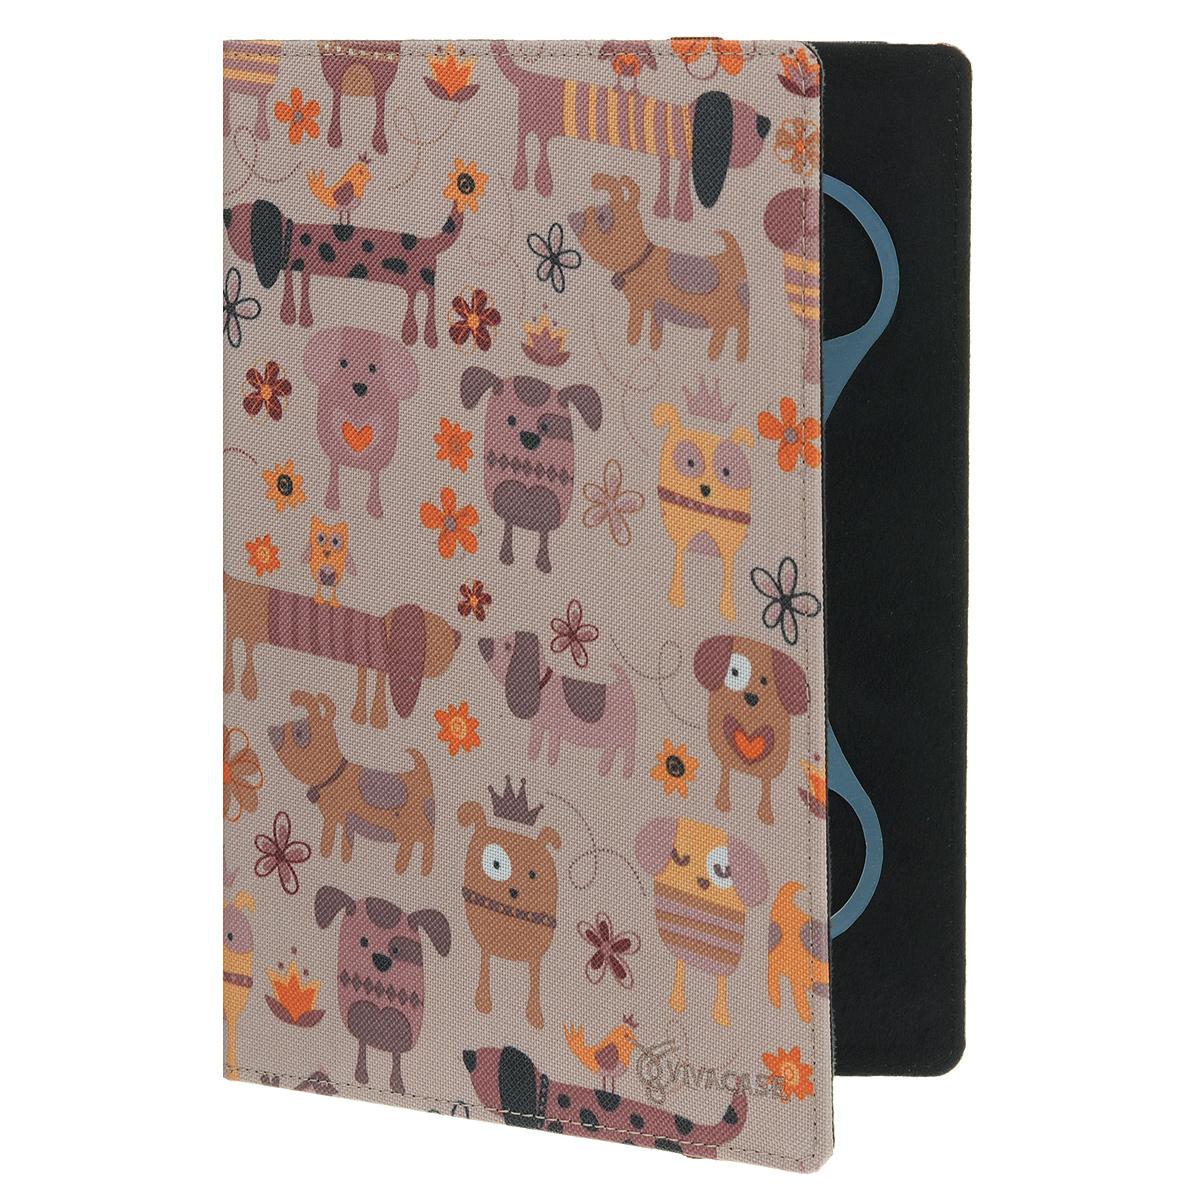 Vivacase Doggy чехол для планшетов 10 (VUC-CDG10)